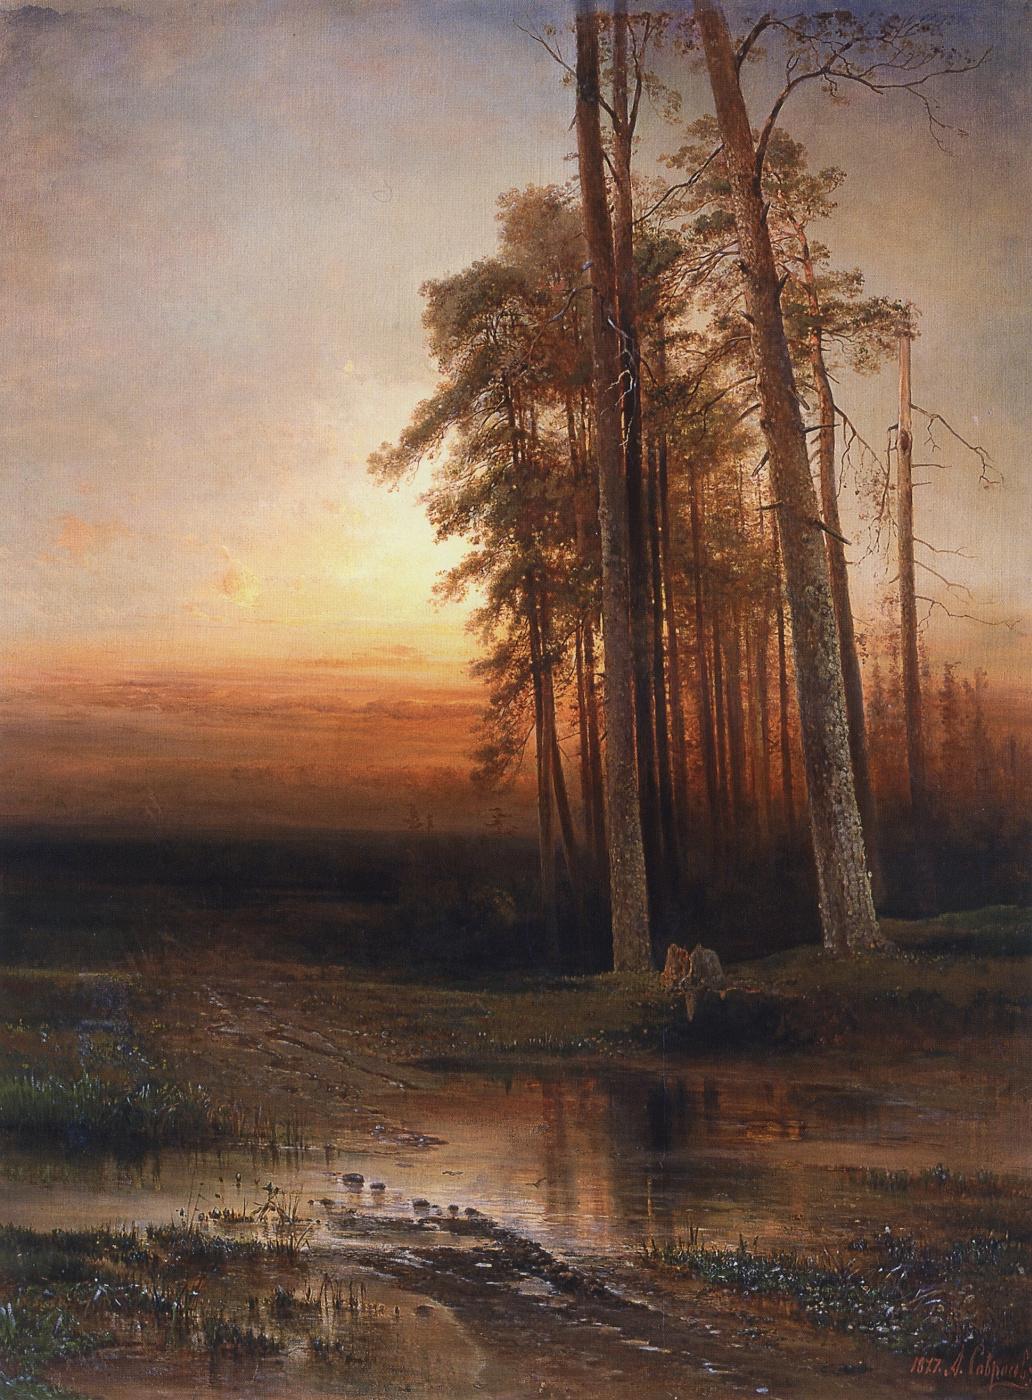 Alexey Savrasov. The evening